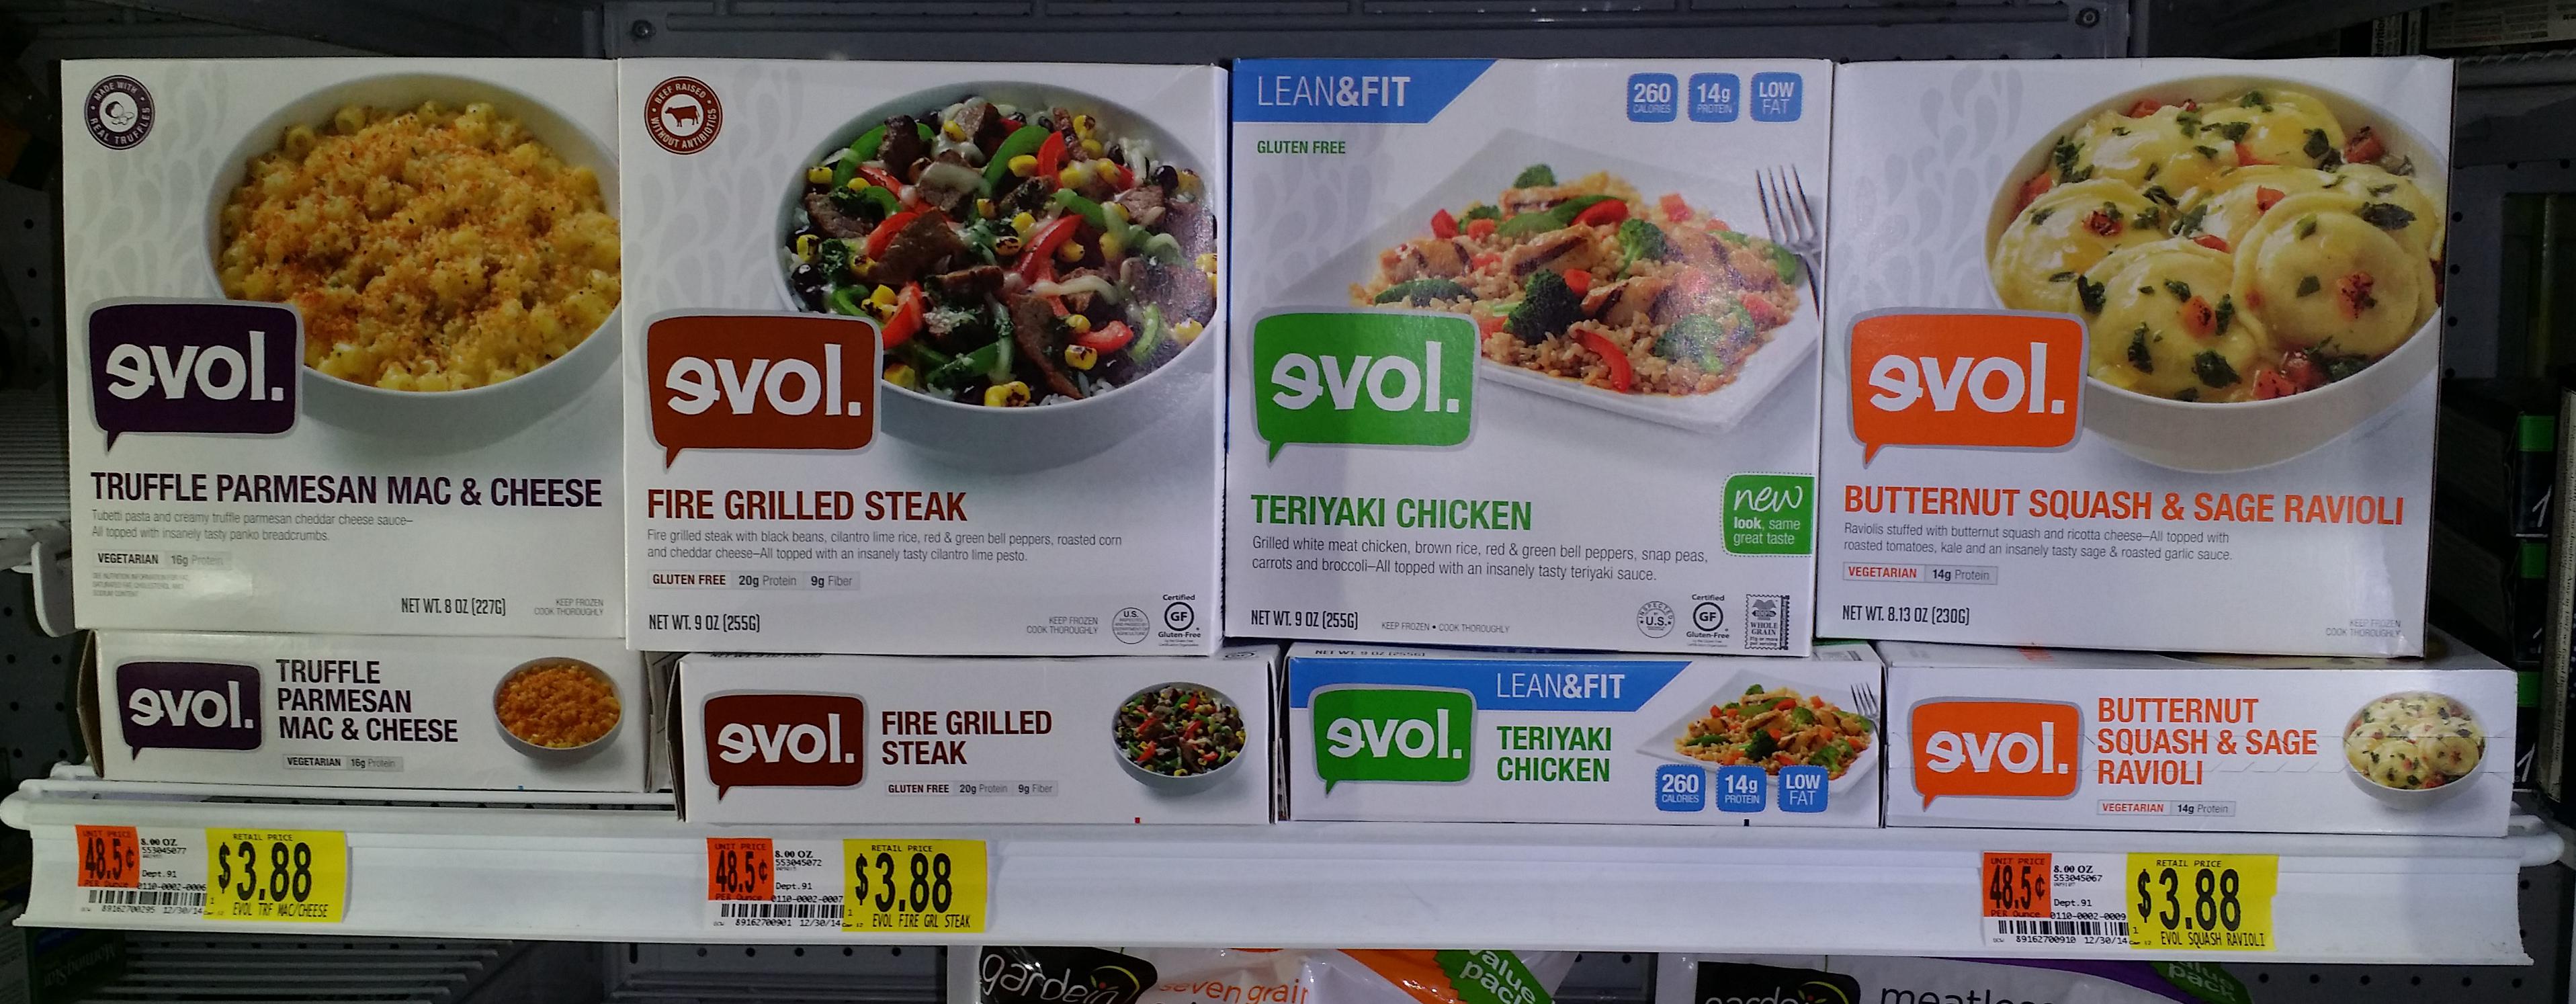 EVOL Frozen Single-Serve Meal Just $2.88 at Walmart!